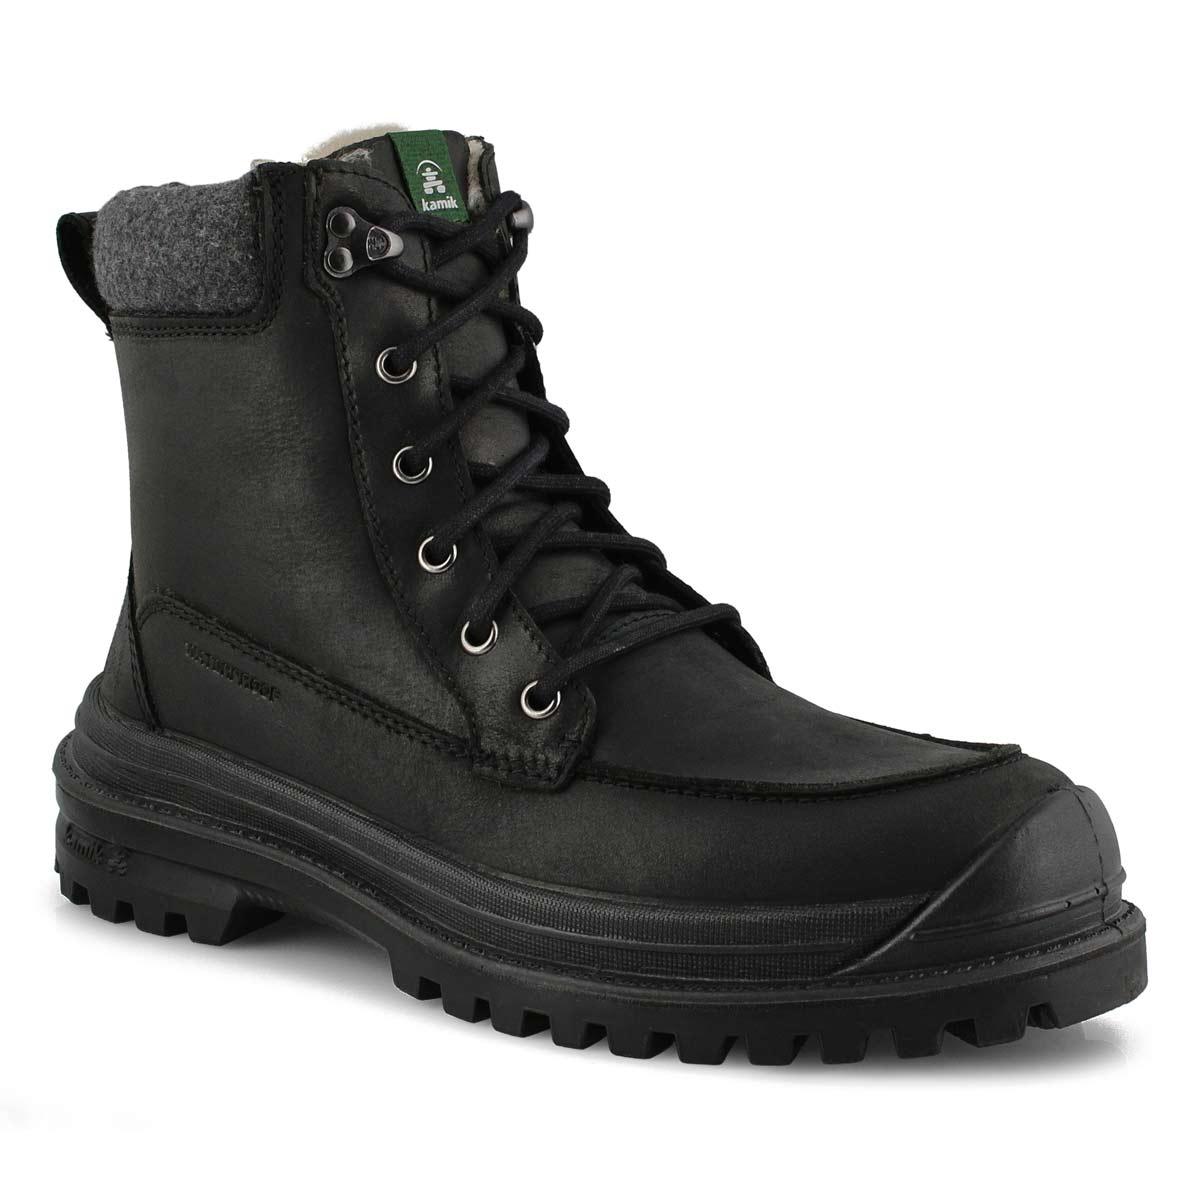 Men's Griffon 2 Waterproof Winter Boot - Black